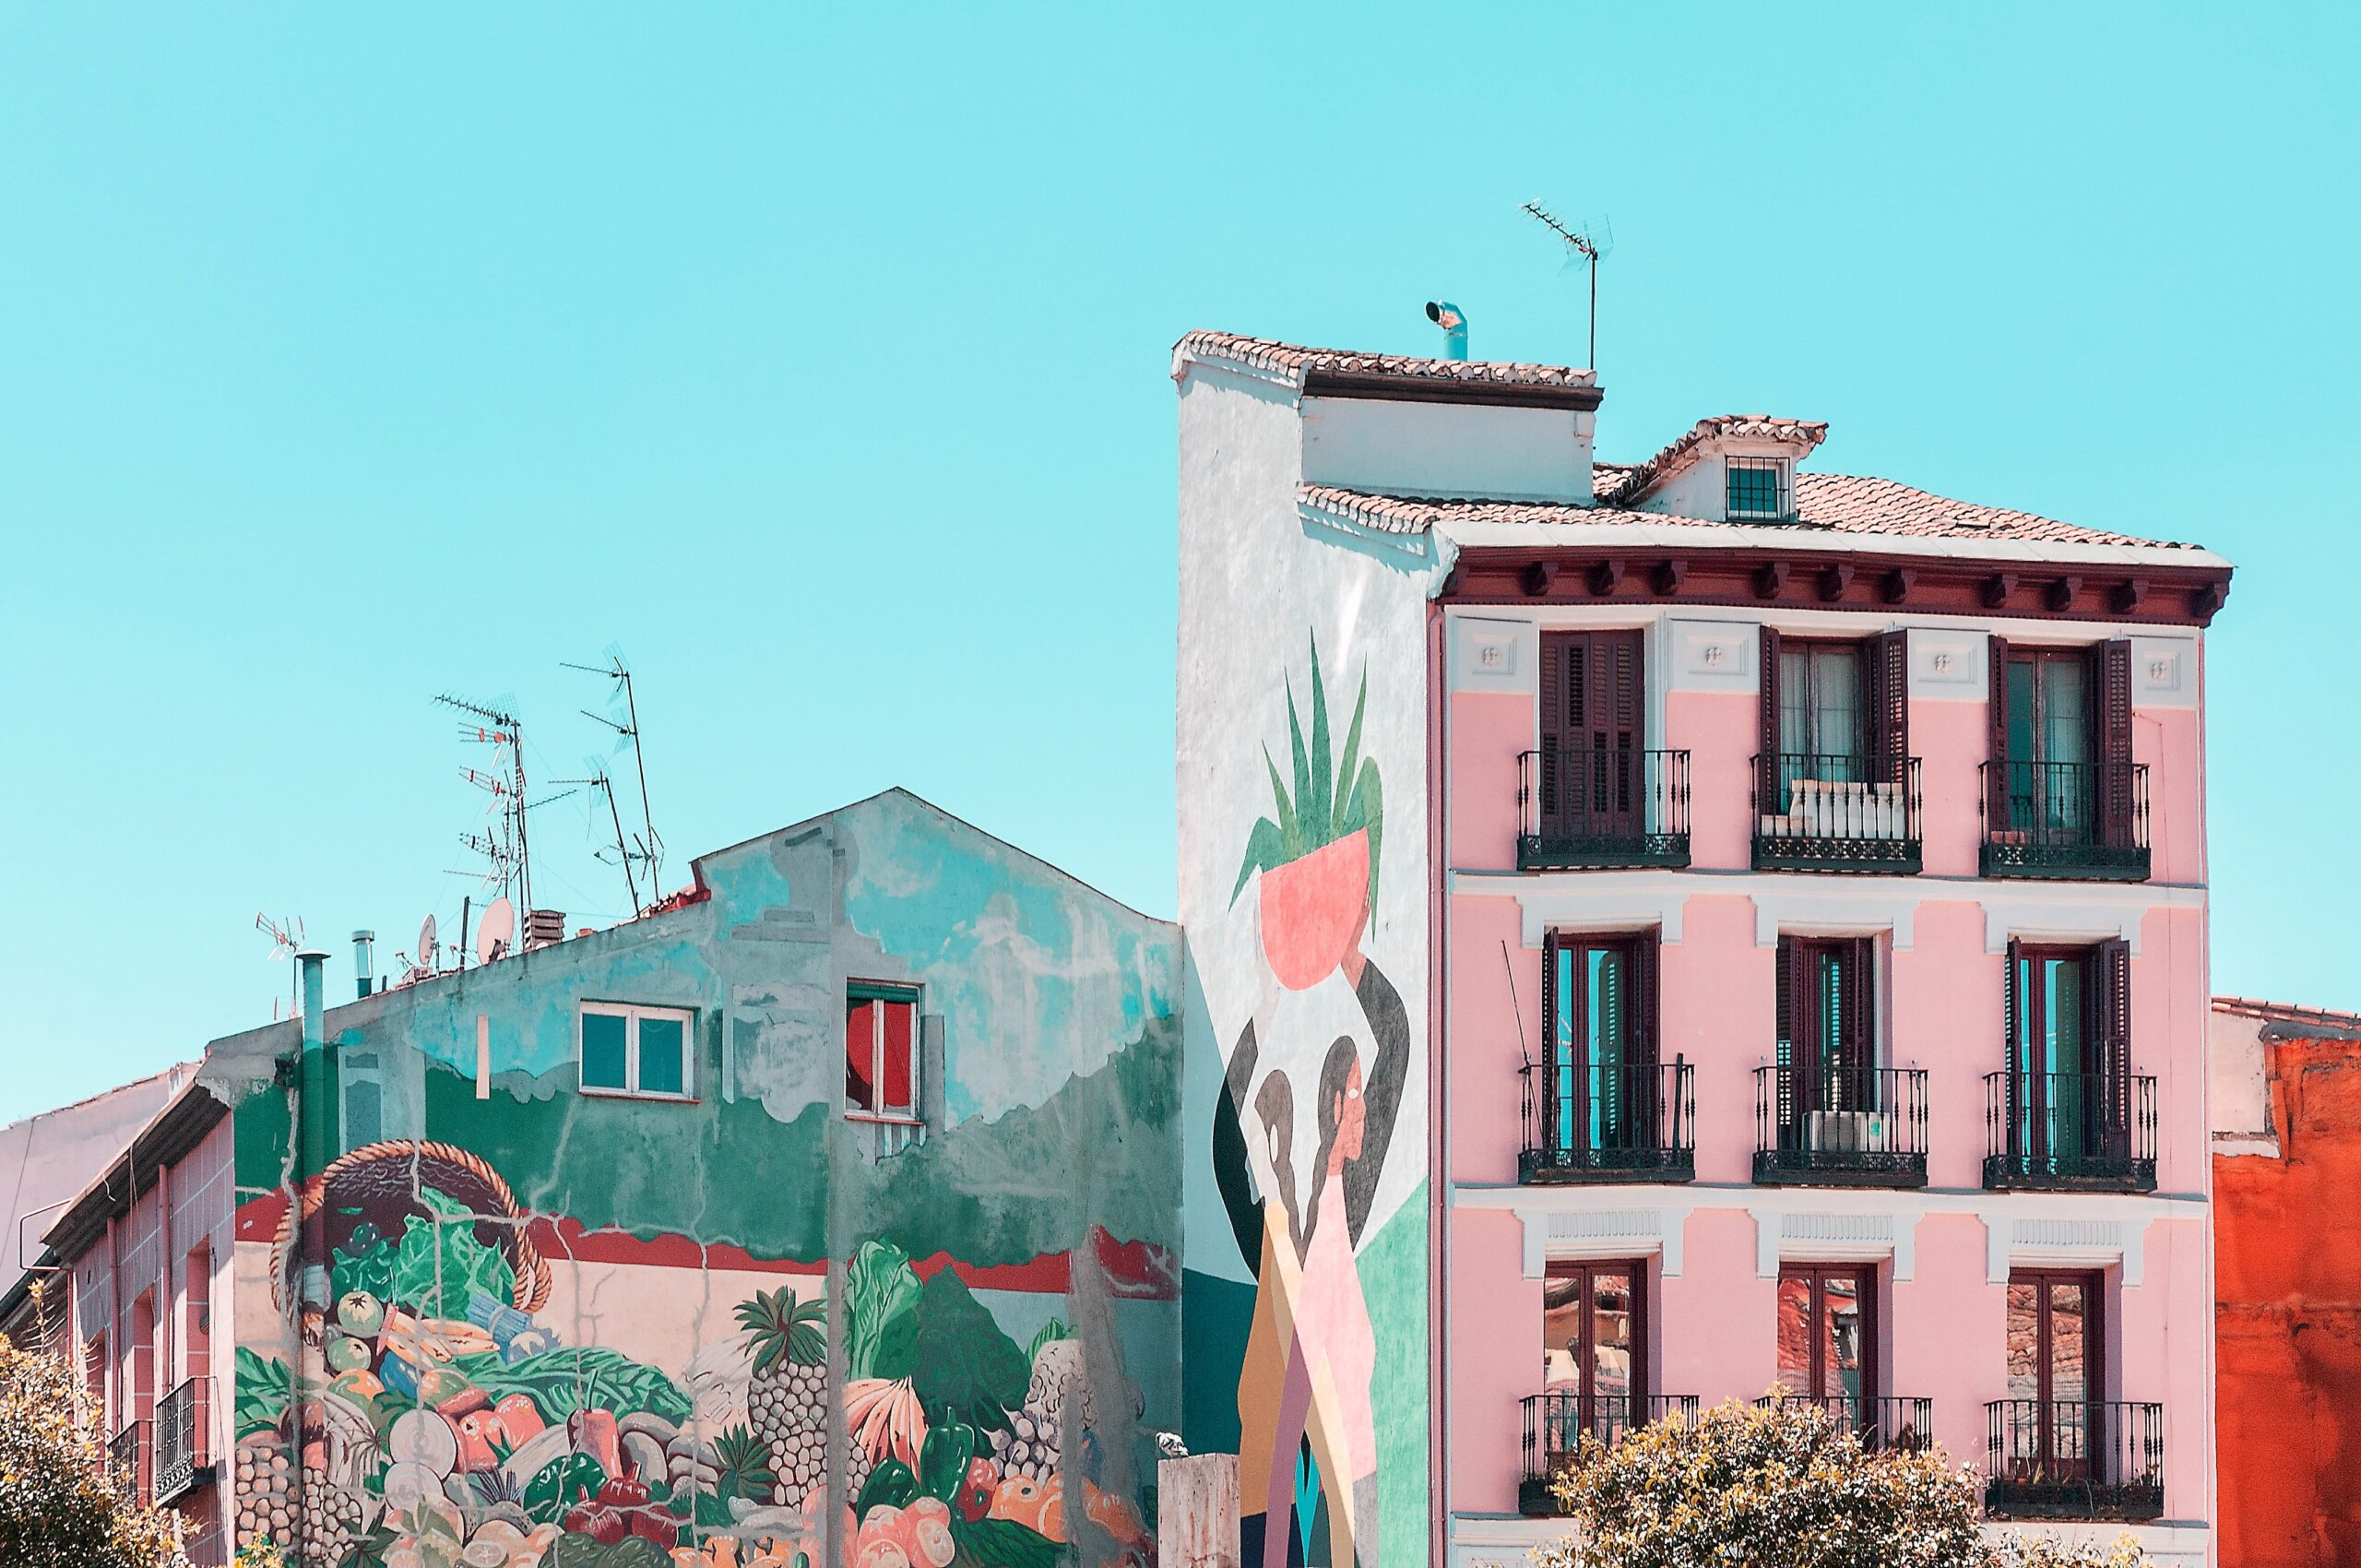 Barrios para alojarse en Madrid 10 consejos para reservar hotel en Madrid